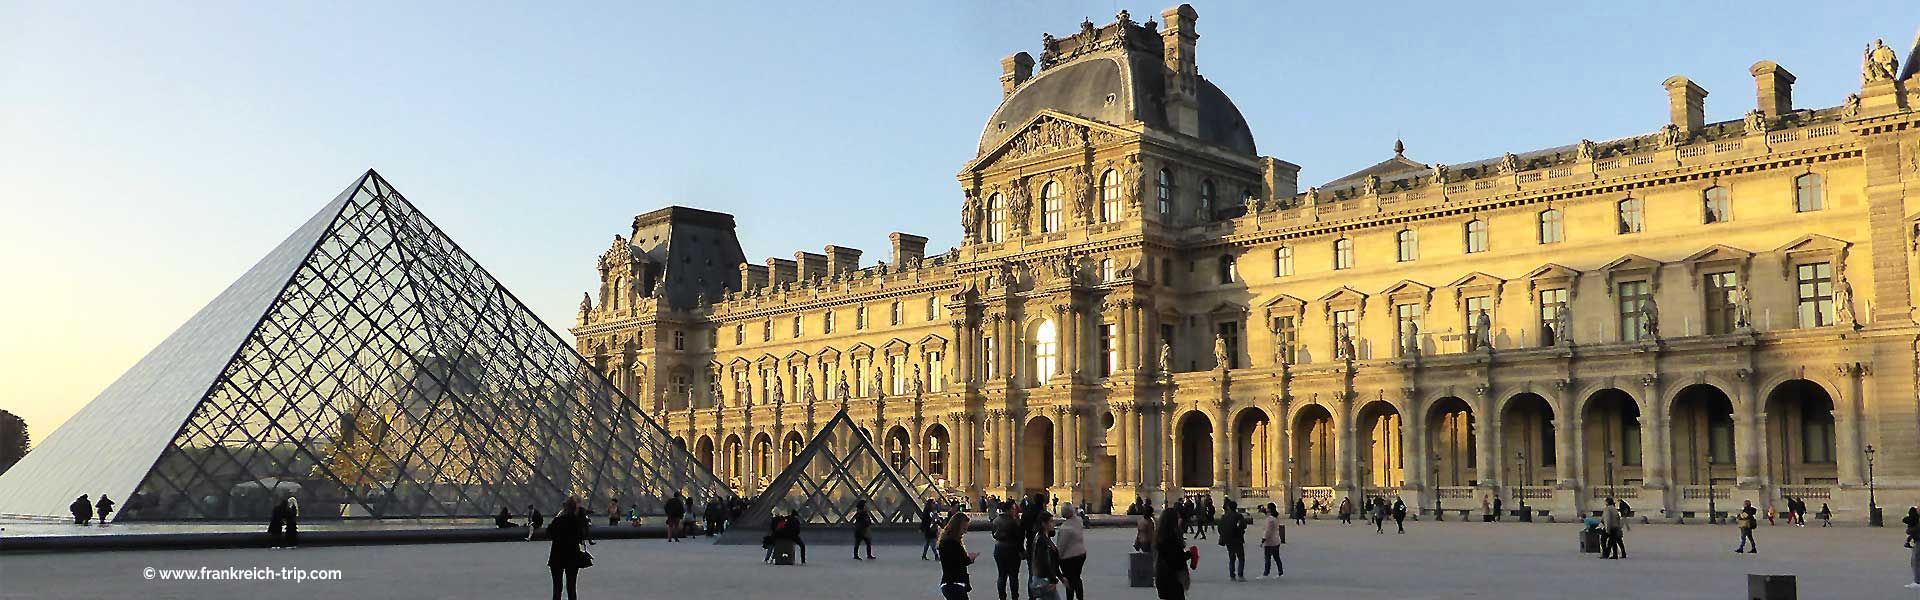 Louvre, Paris Sehenswürdigkeit